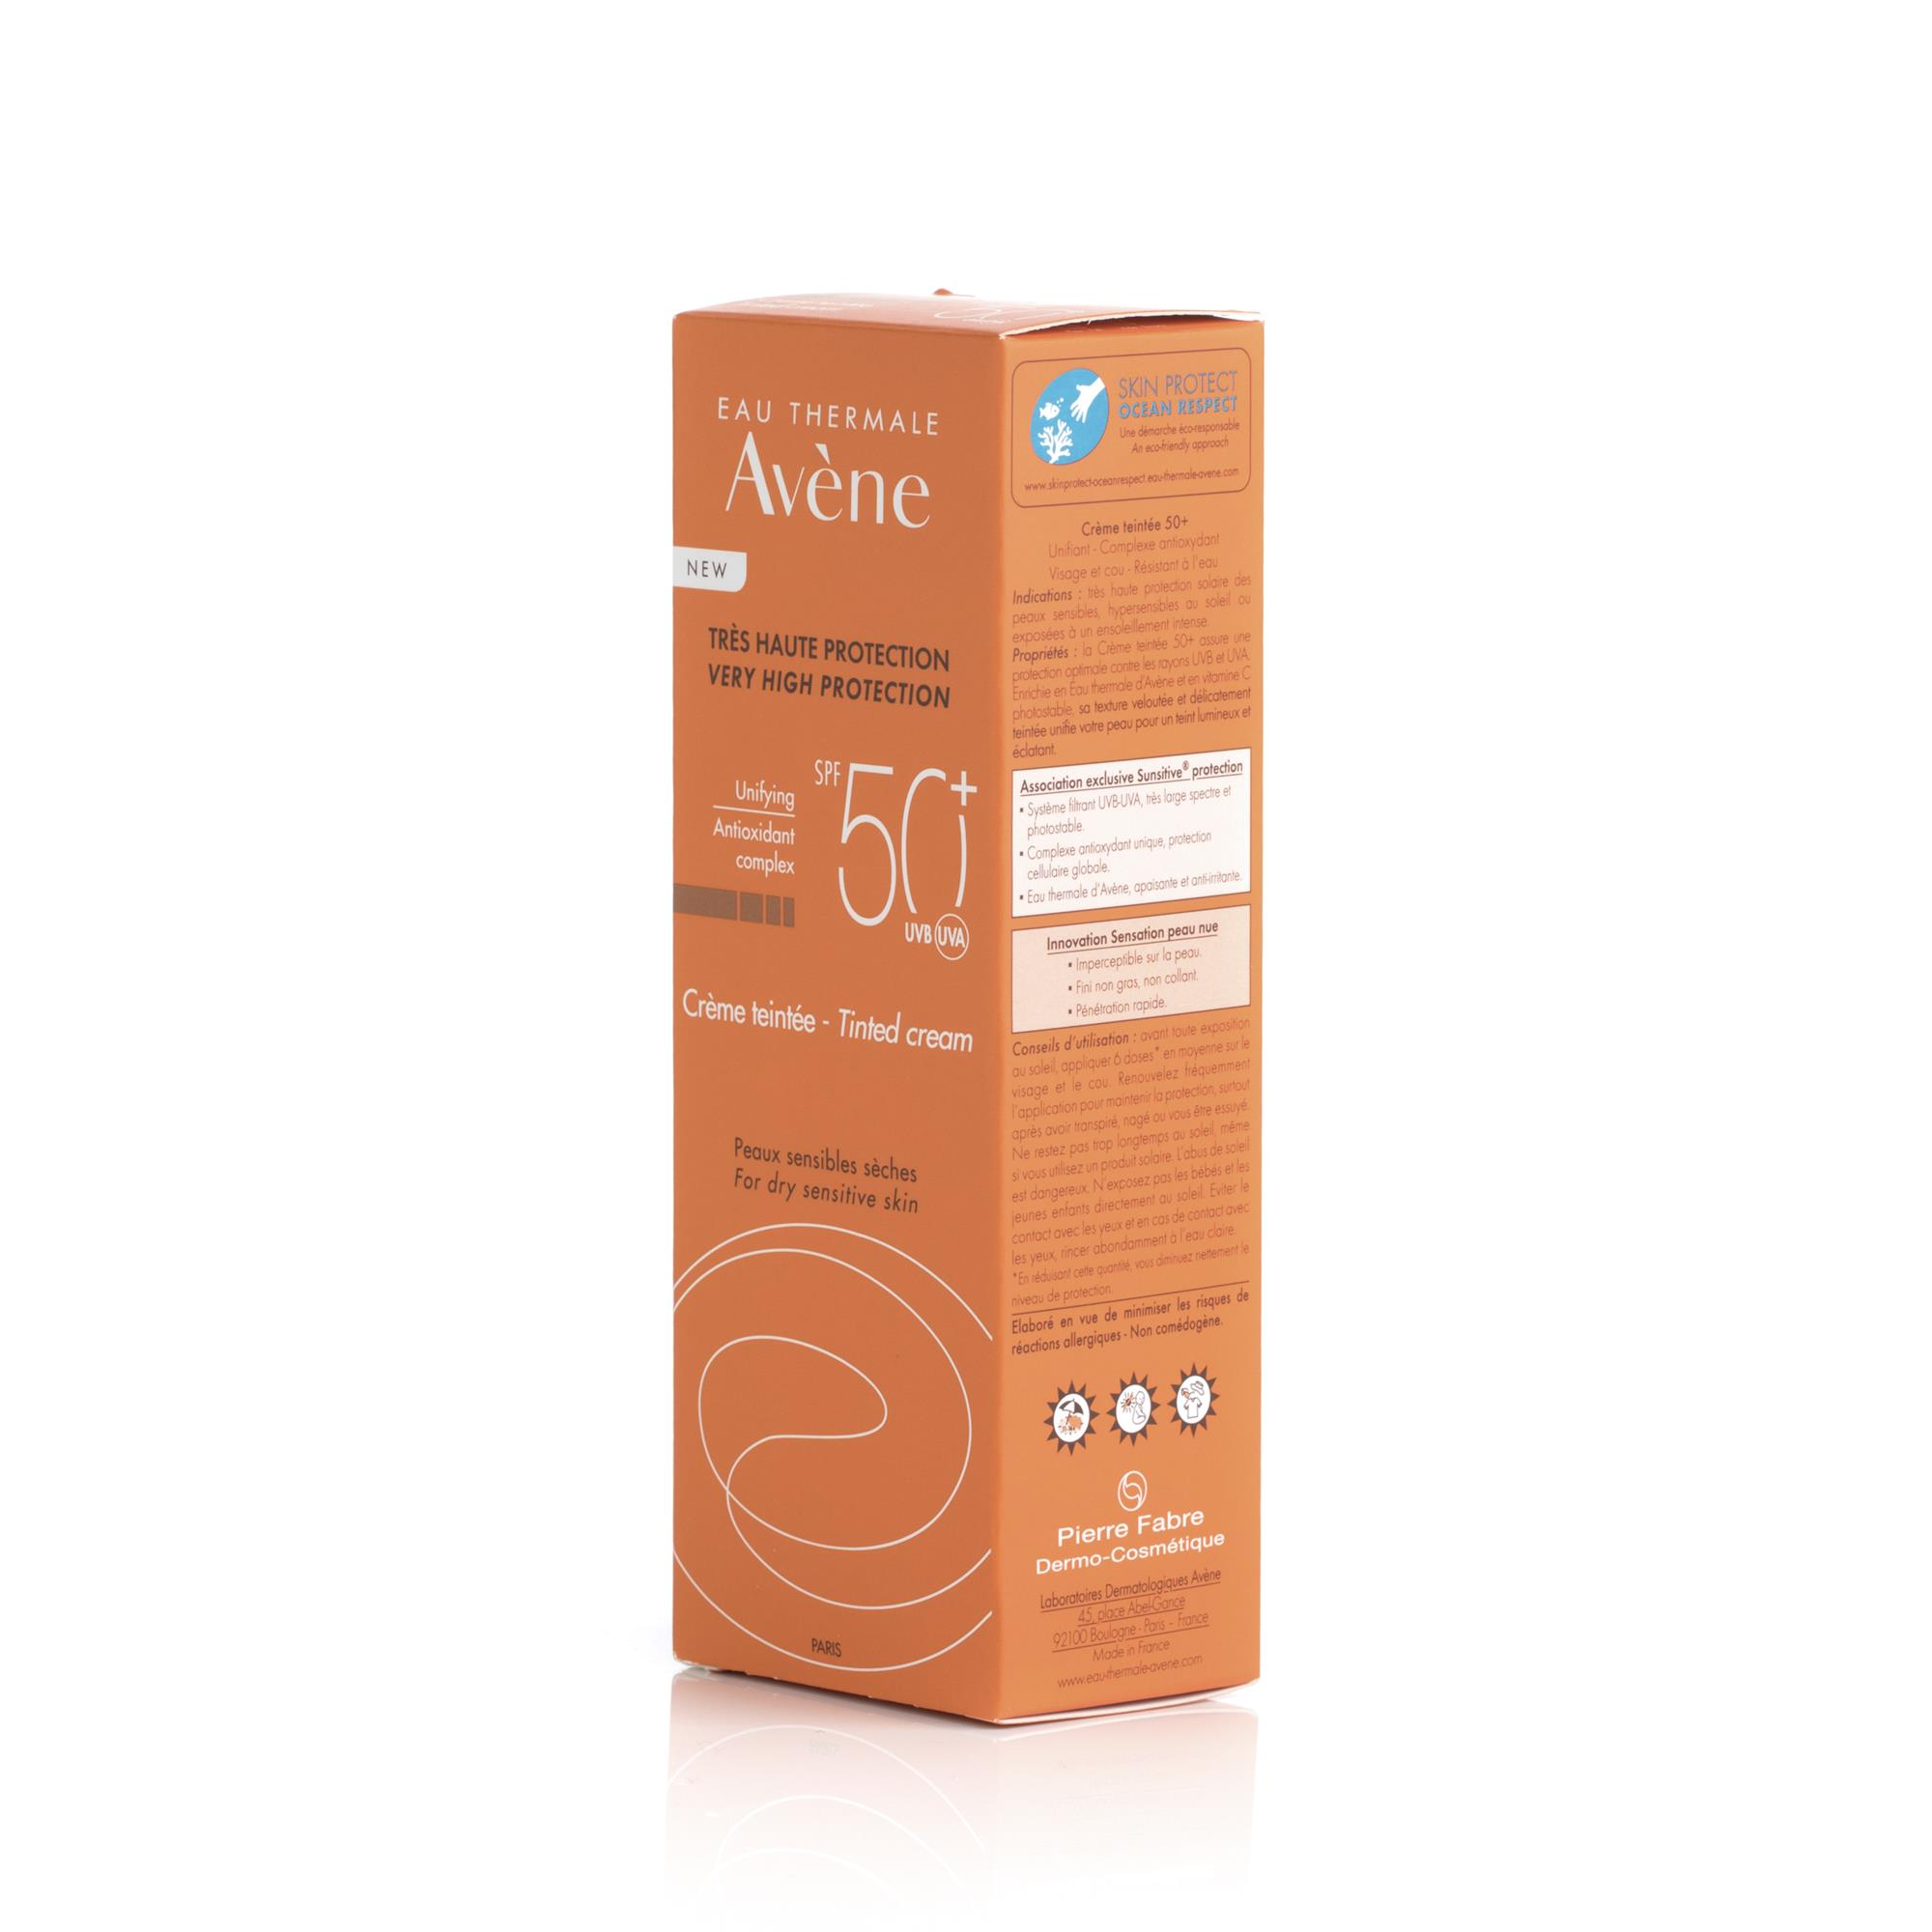 AVENE 50+ CREME TEINTEE 50ML - Beauty, Skin & Hair care..